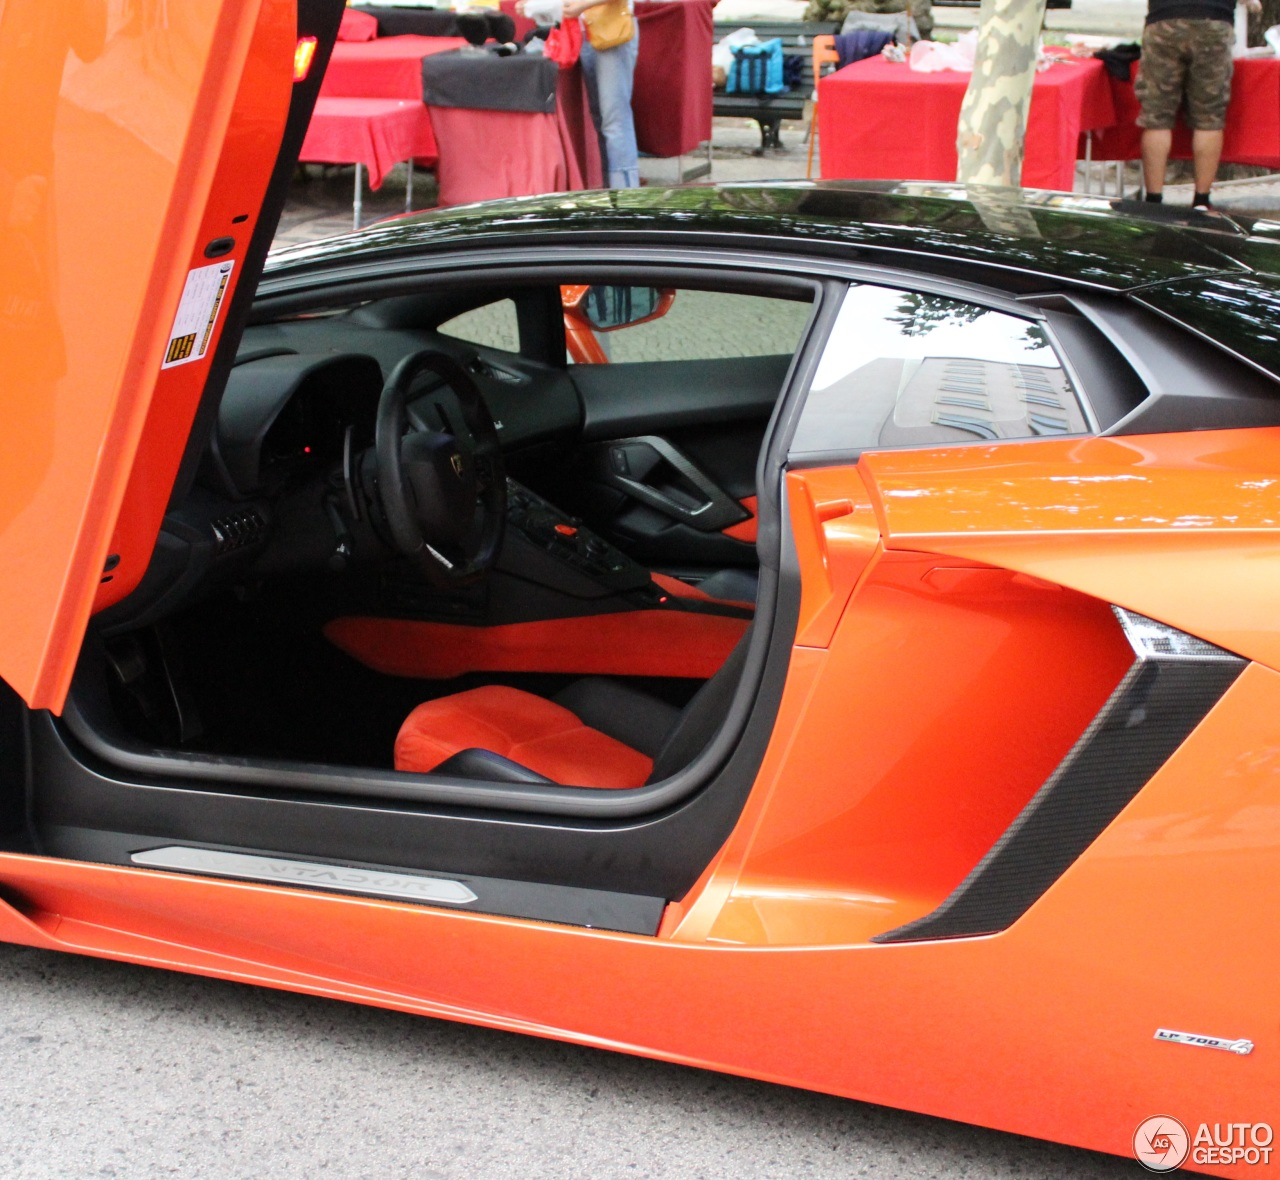 2014 Lamborghini Aventador Lp700 4: Lamborghini Aventador LP700-4